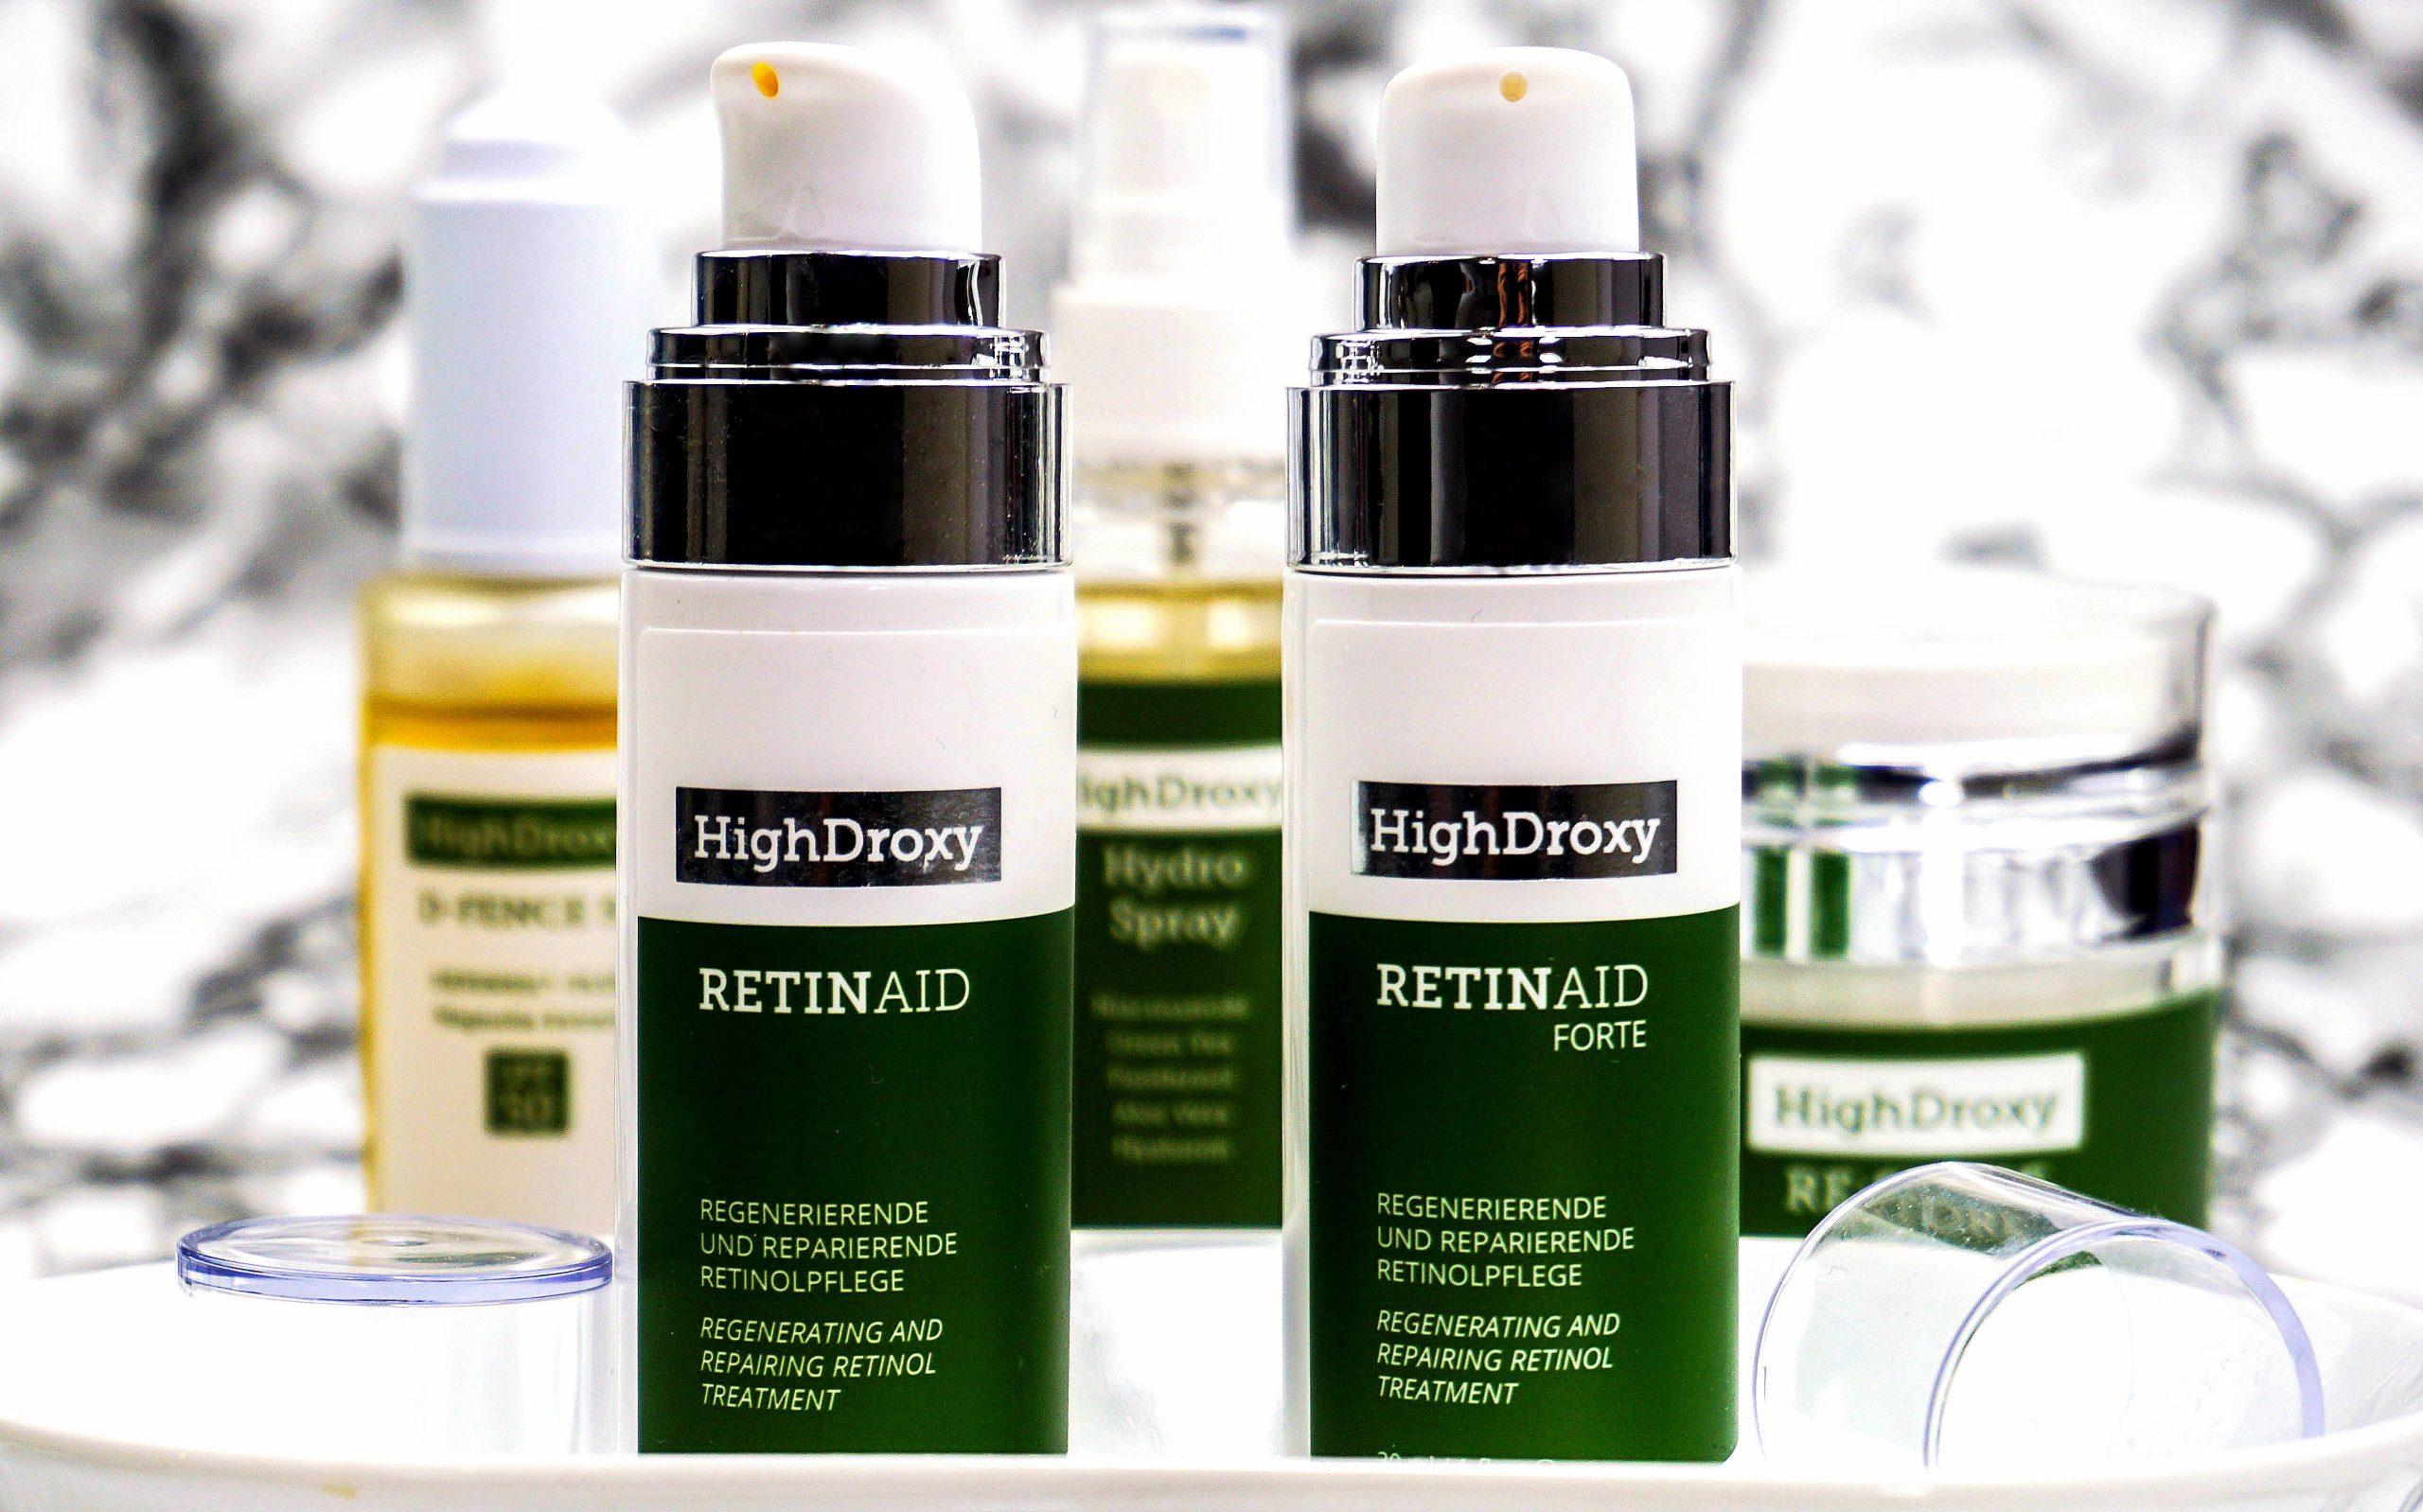 HIGHDROXY Retinaid & Retinaid Forte - Highendlove